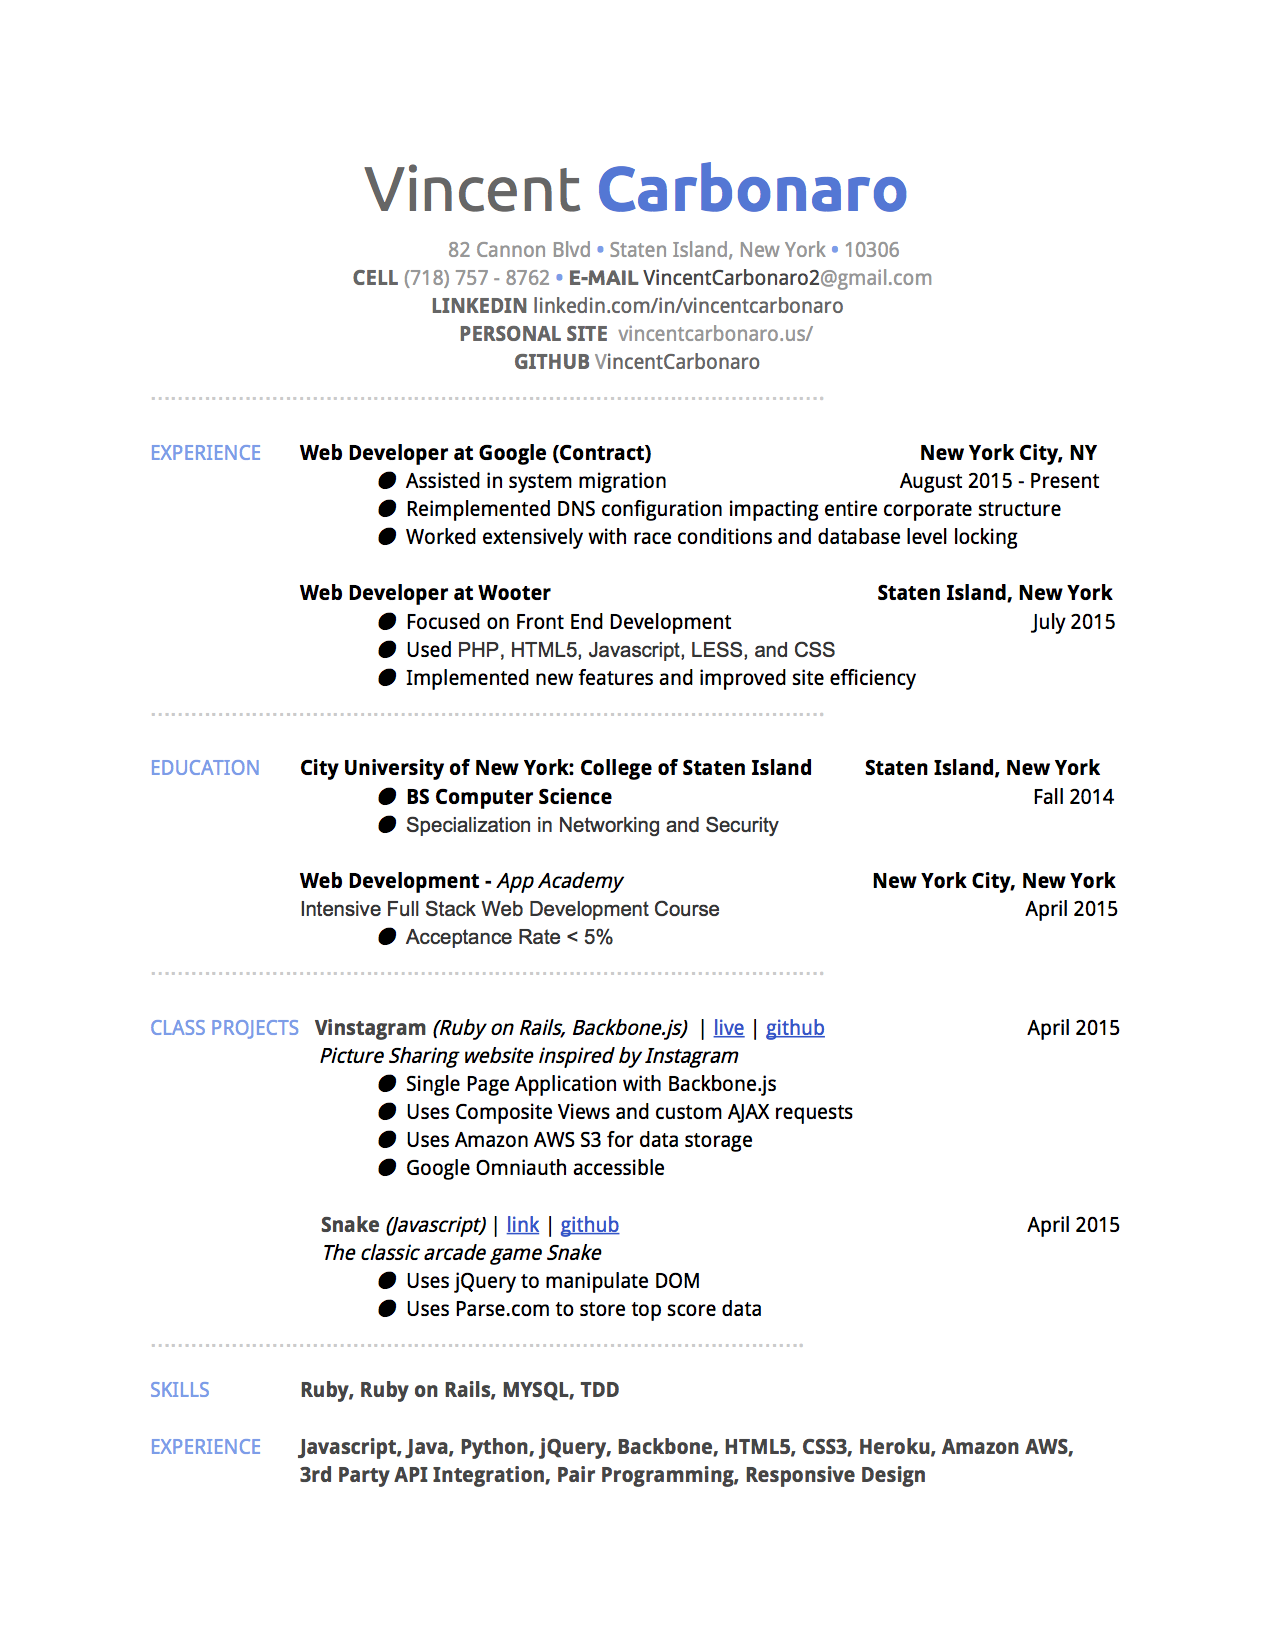 Vincent Carbonaro